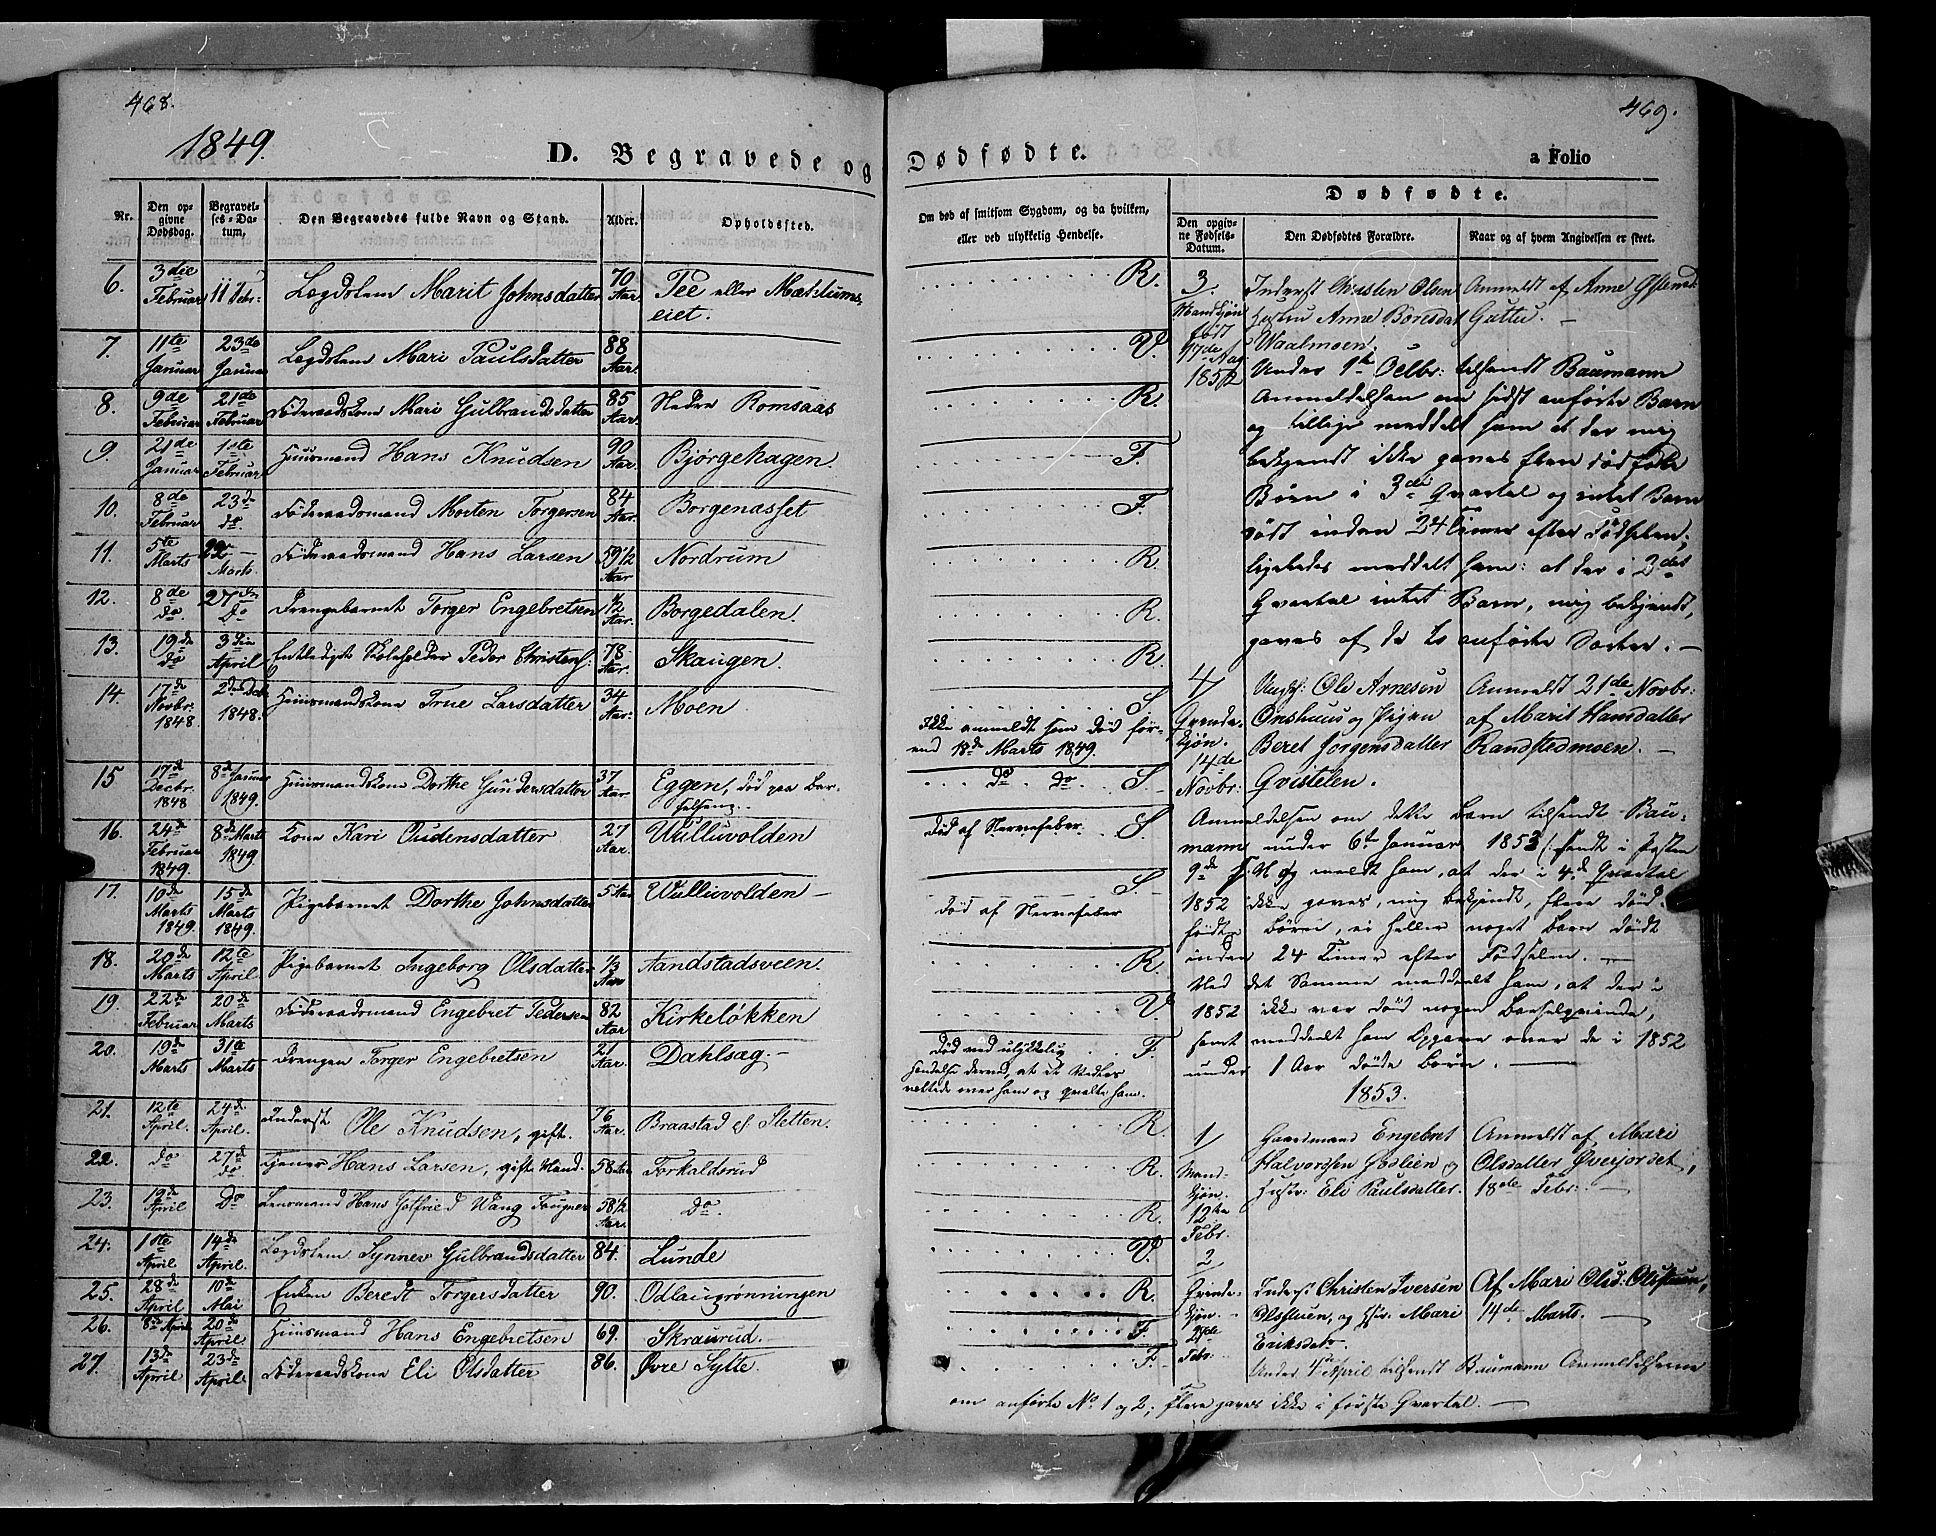 SAH, Ringebu prestekontor, Ministerialbok nr. 6, 1848-1859, s. 468-469